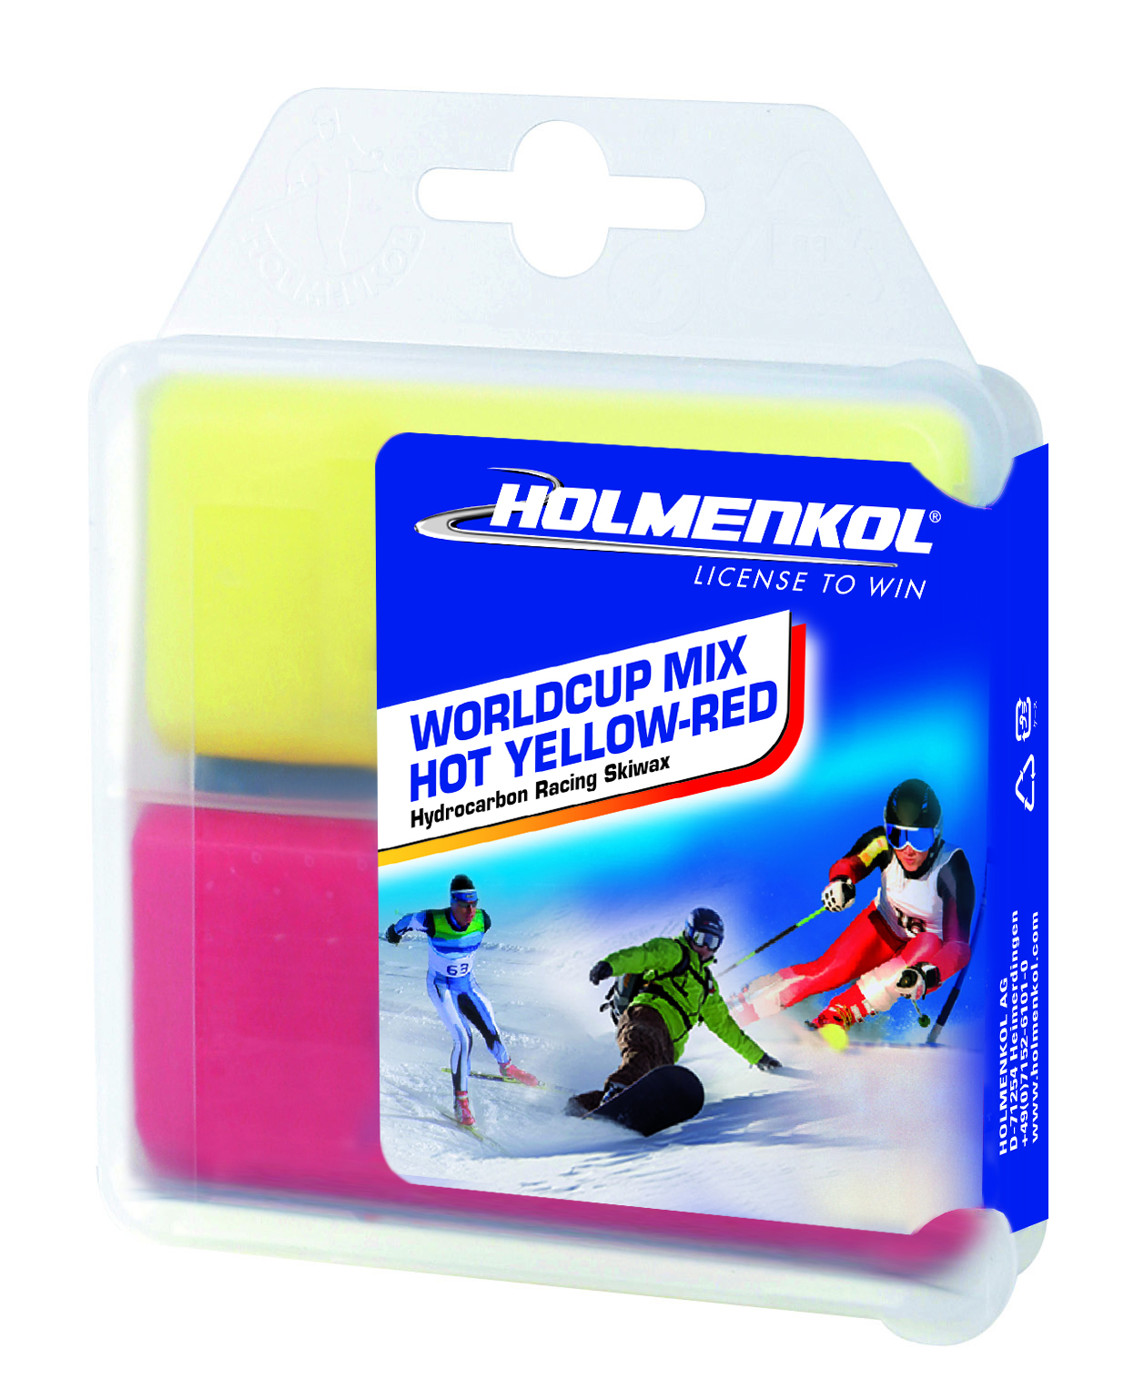 HOLMENKOL Basewax Mix HOT Alpha-Beta